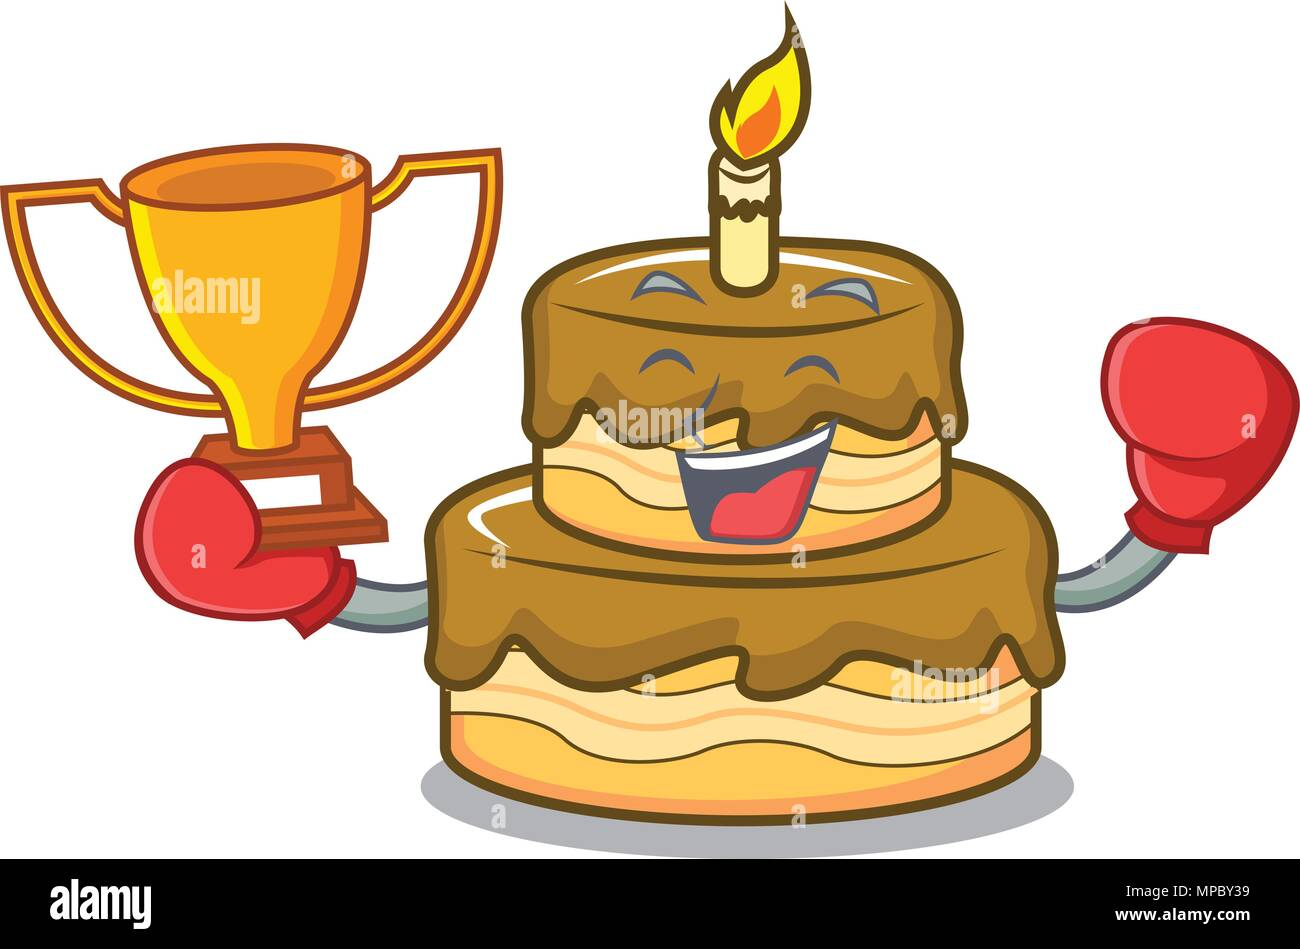 Fabulous Boxing Winner Birthday Cake Mascot Cartoon Stock Vector Art Funny Birthday Cards Online Alyptdamsfinfo